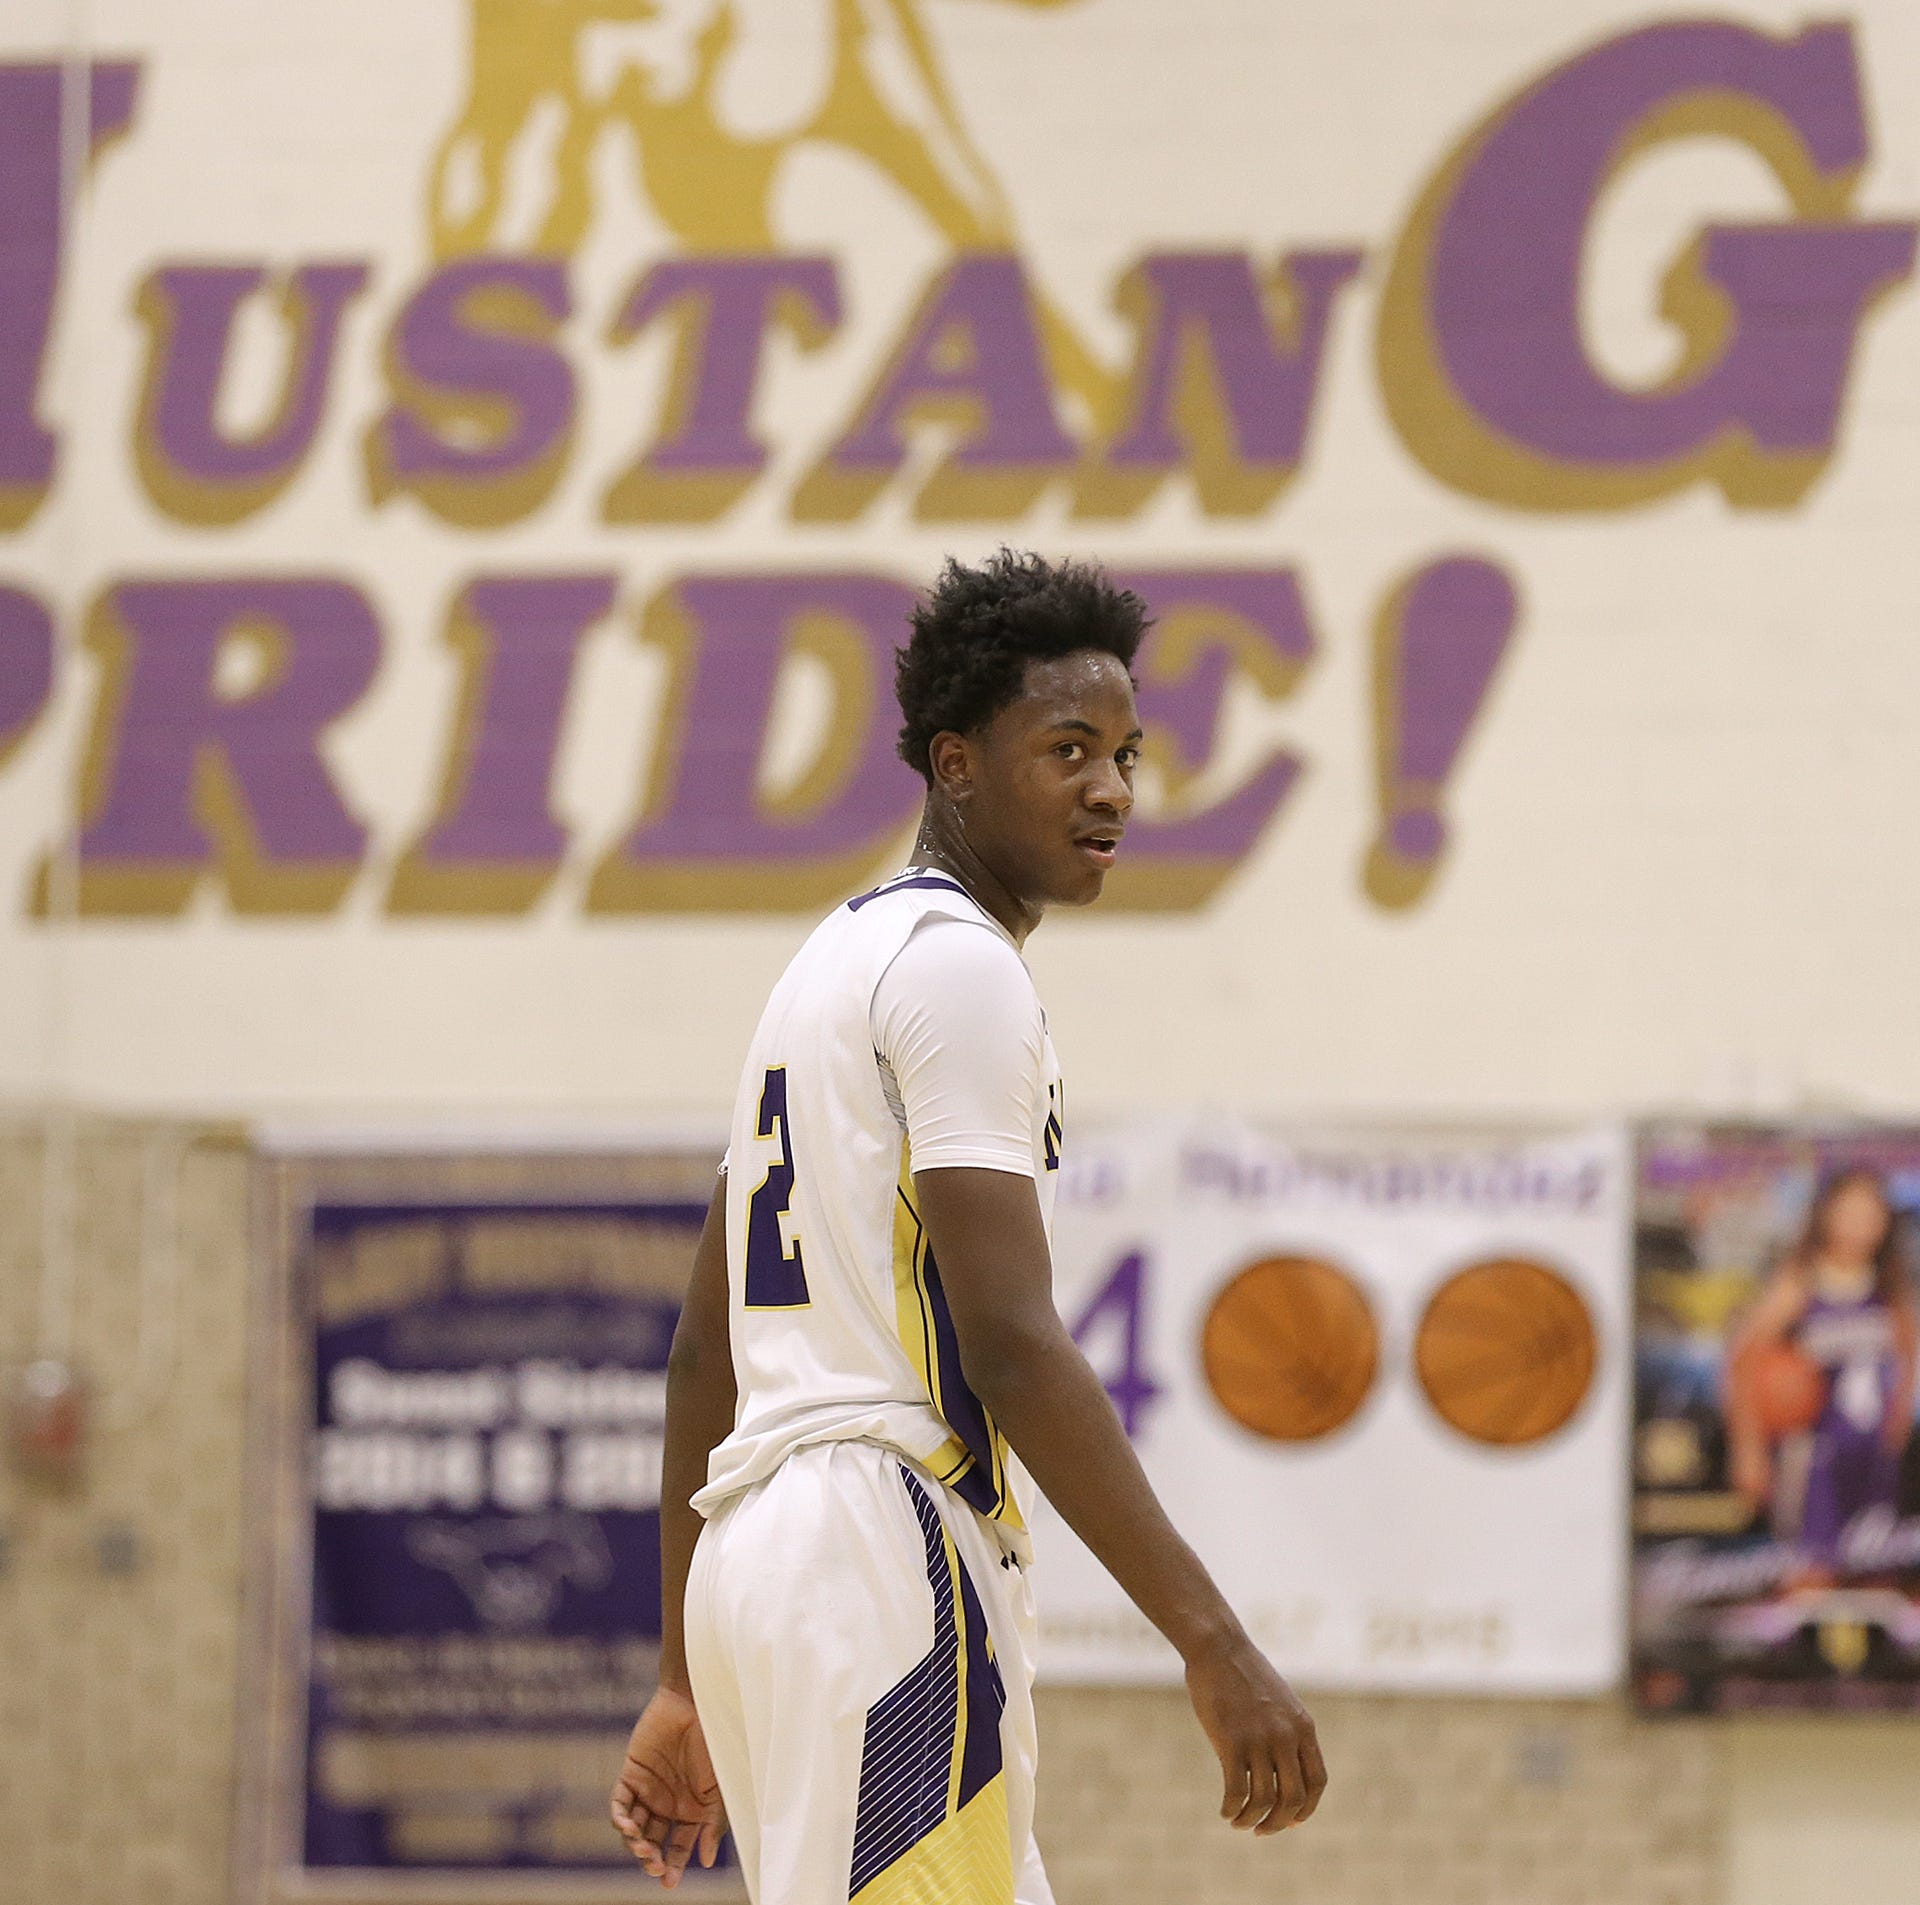 Burges basketball defeated Coronado Tuesday night at Burges High School 73-56.